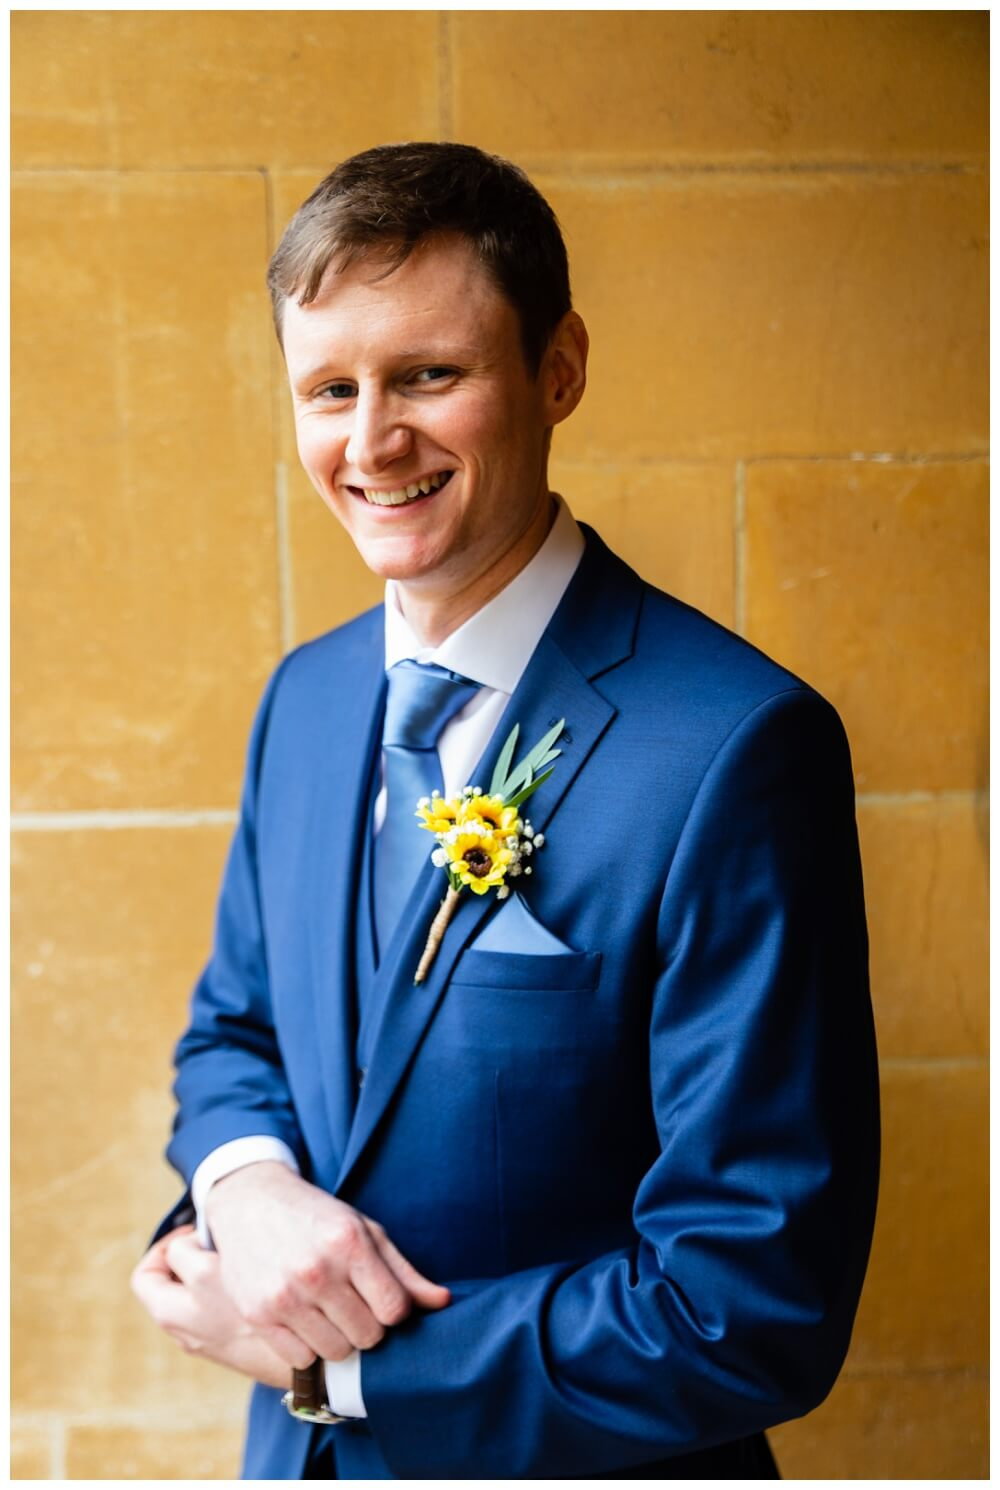 Coombe Lodge groom portrait